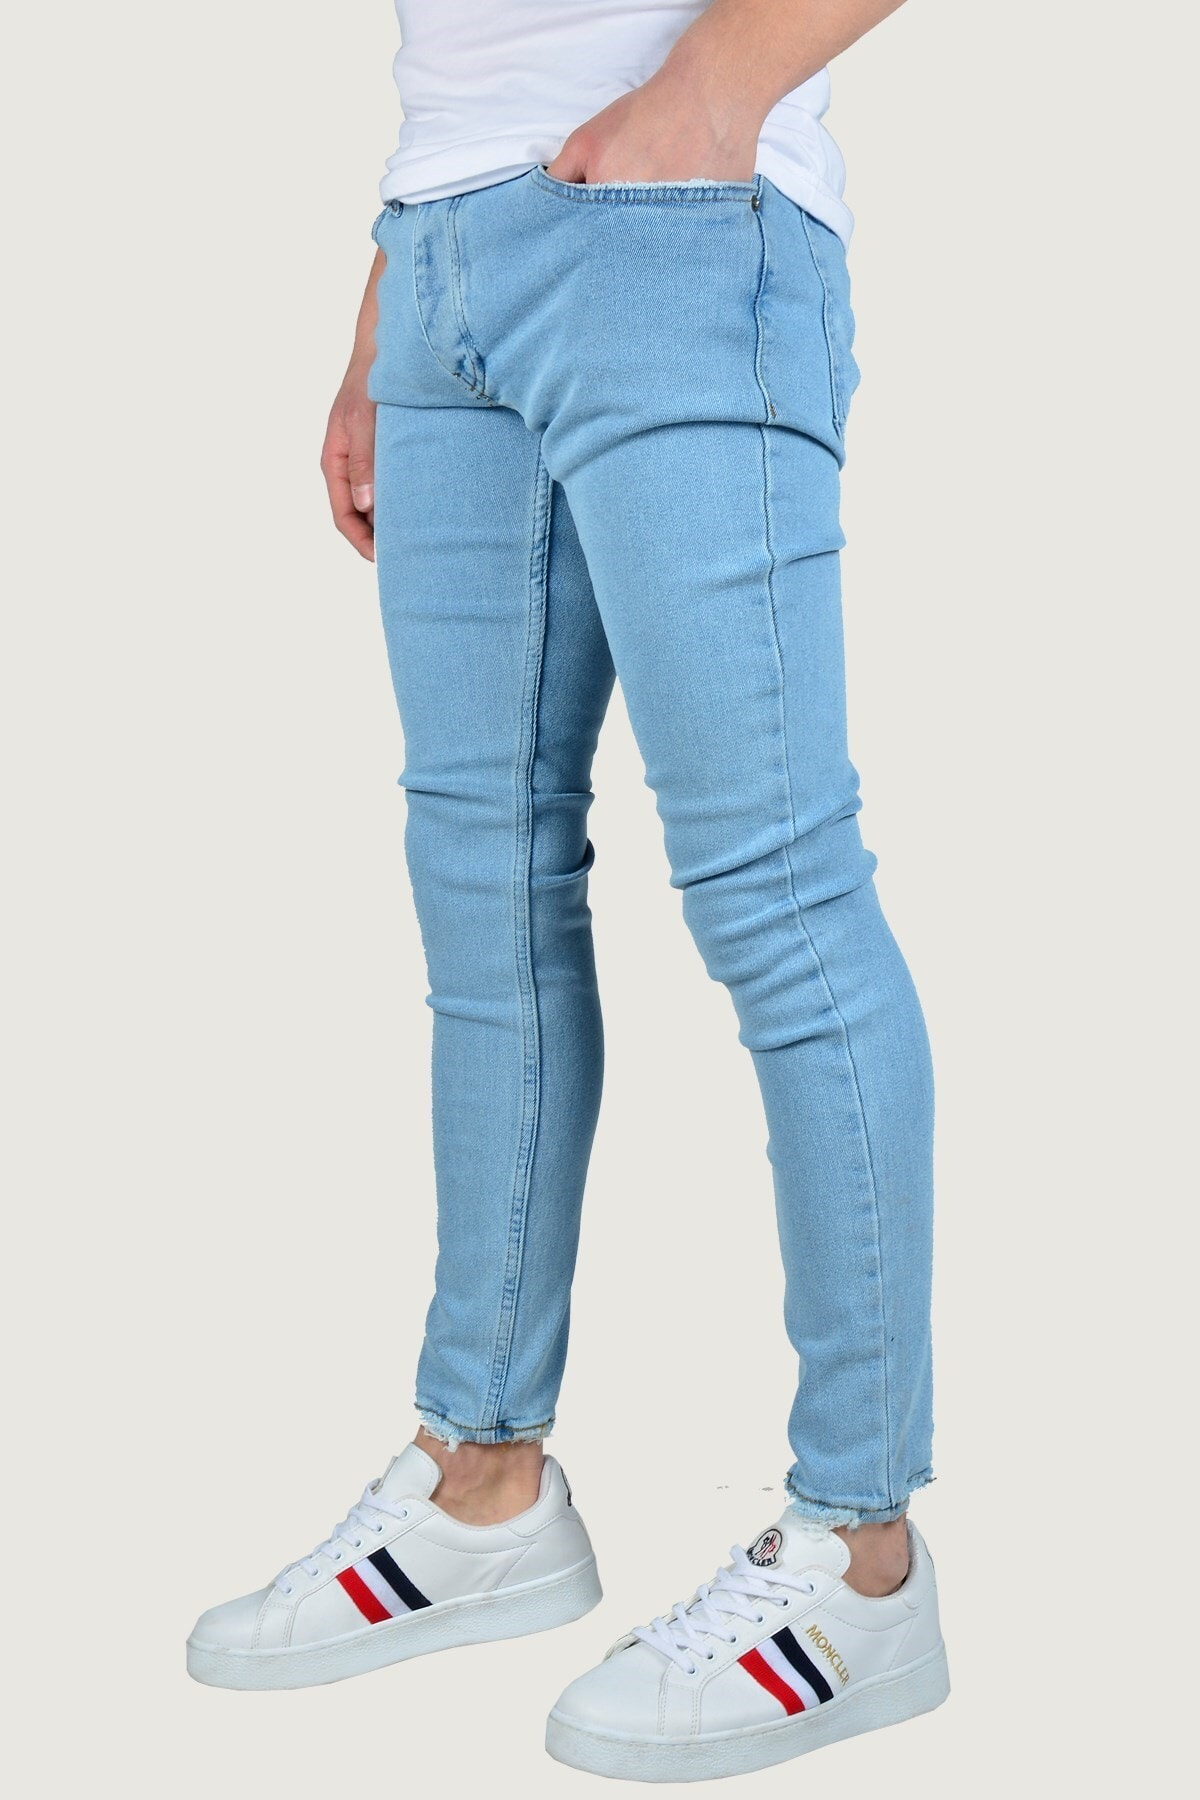 Terapi Men Erkek Kot Pantolon 9K-2100320-011 Buz Mavisi 3